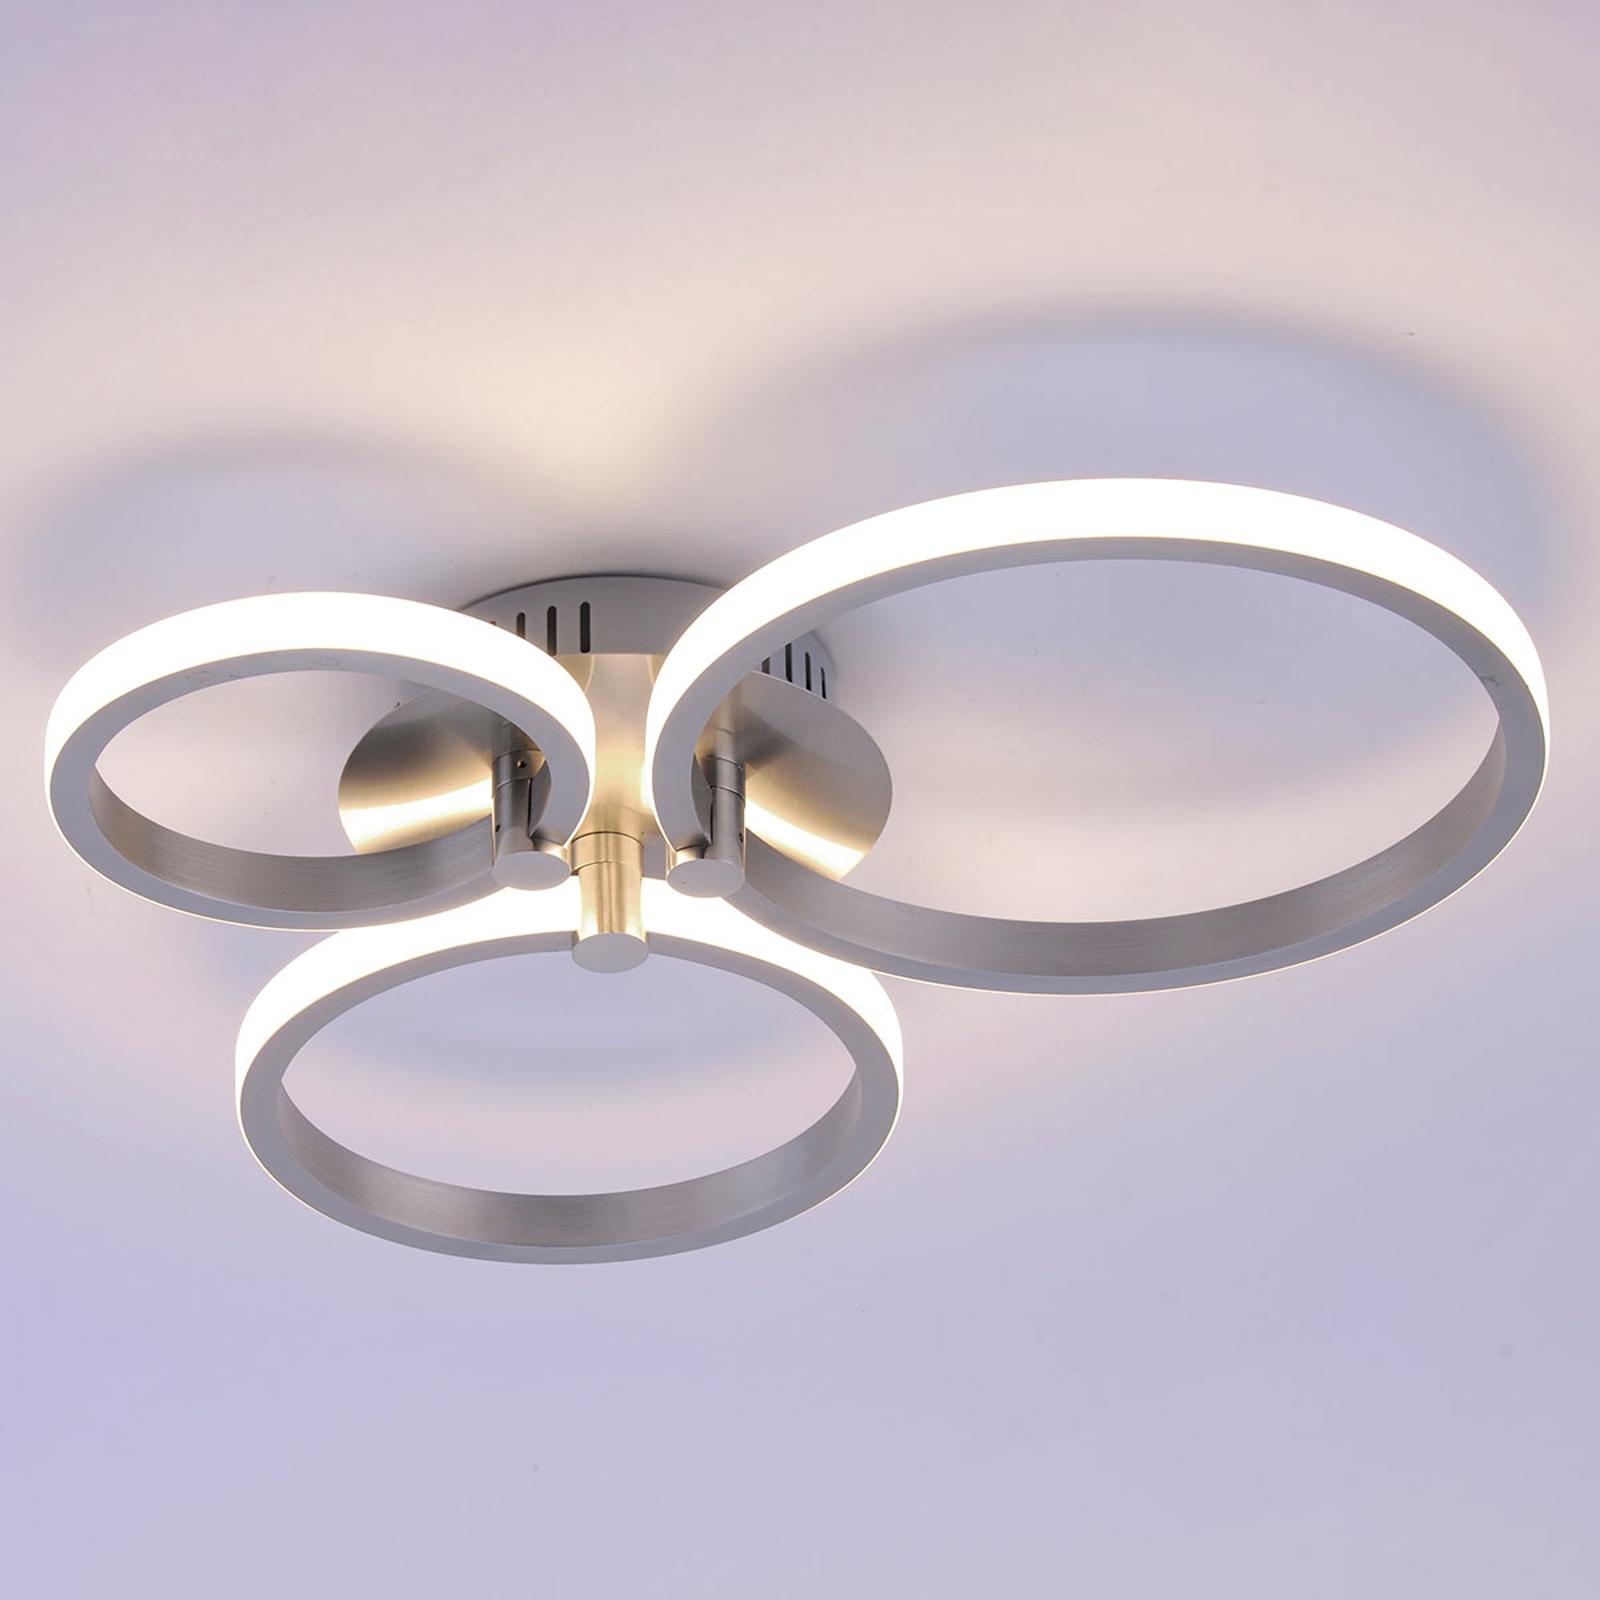 LED-Deckenleuchte Johanna 3-flammig